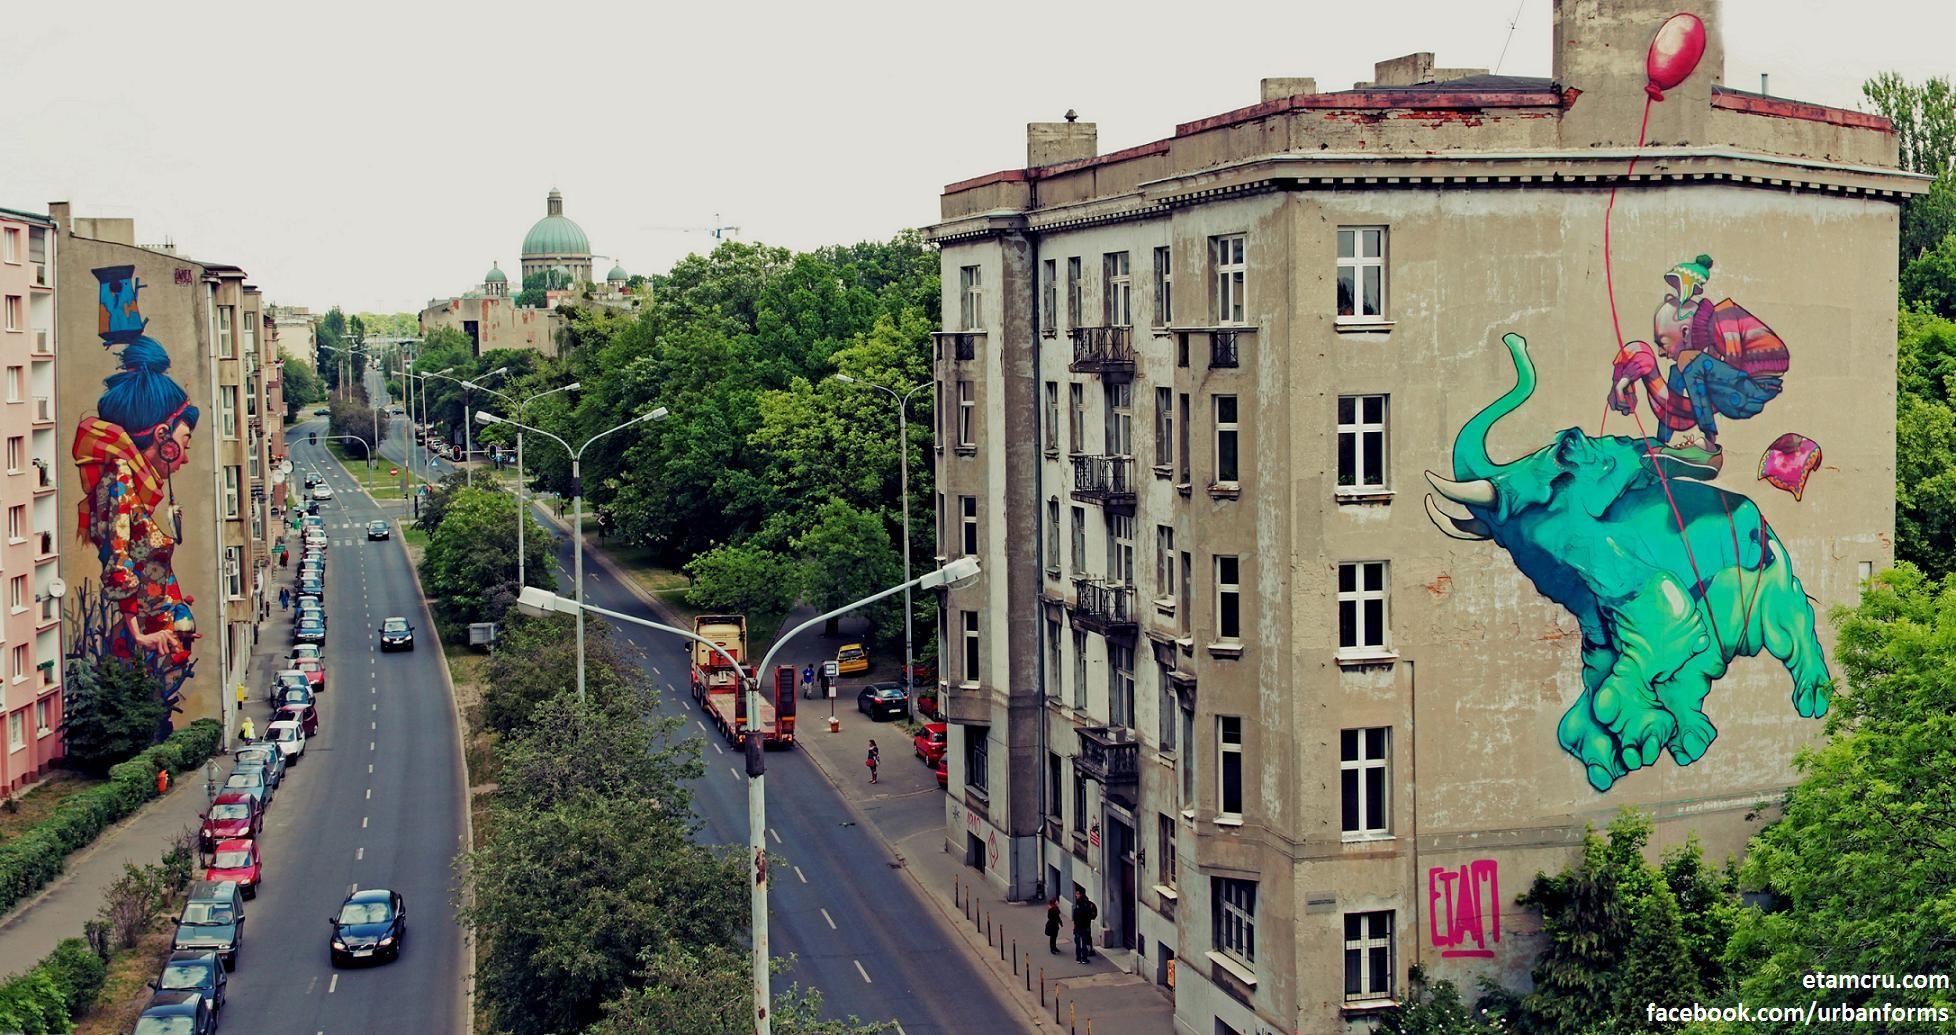 street art By Sainer from Etam Crew. On Urban Forms Foundation in Lodz, Poland 2